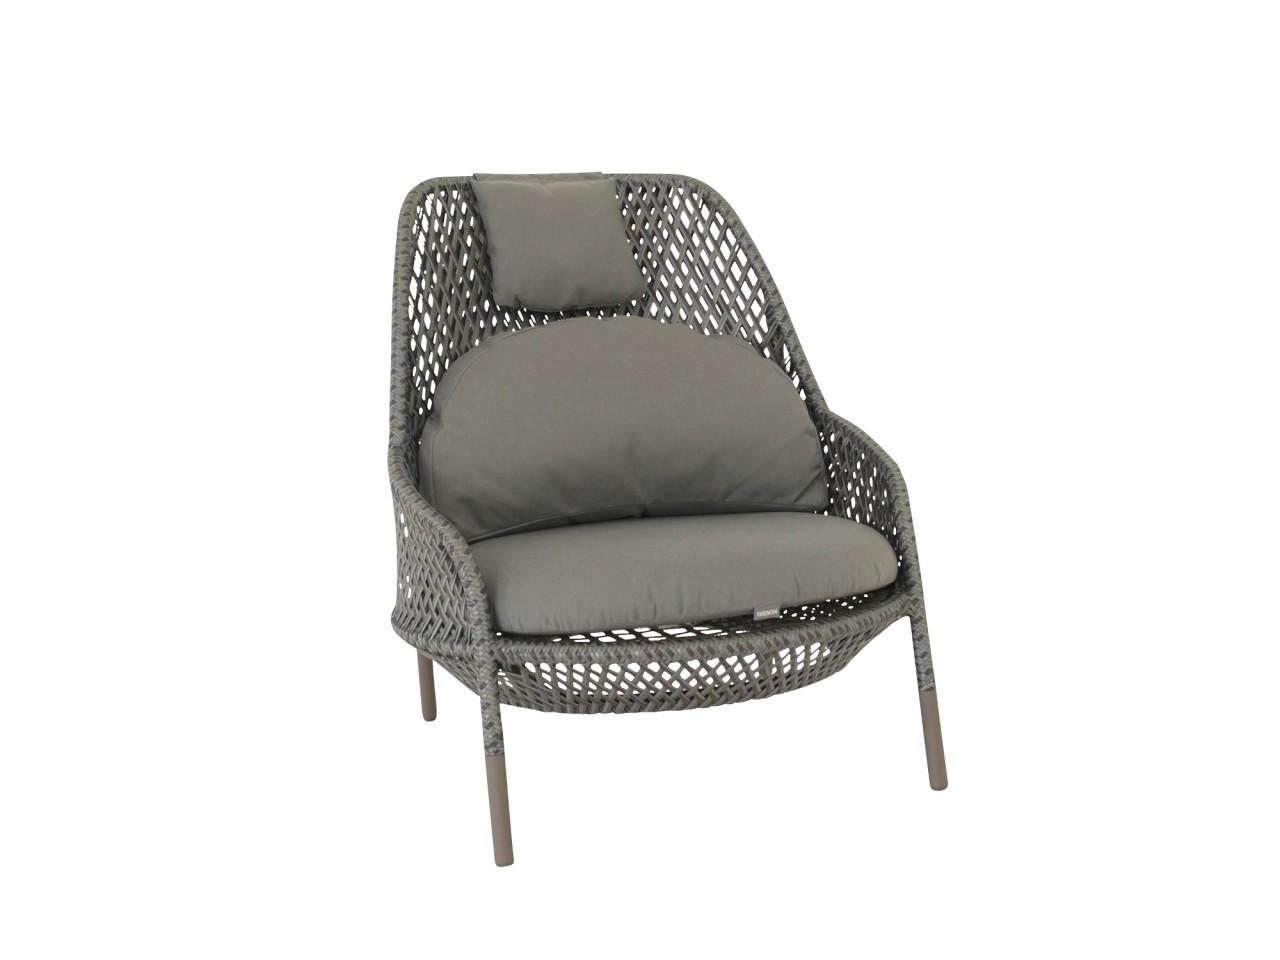 dedon ahnda hochlehner sessel mit kissen sessel in der farbe graphit dedon lagerware dedon. Black Bedroom Furniture Sets. Home Design Ideas